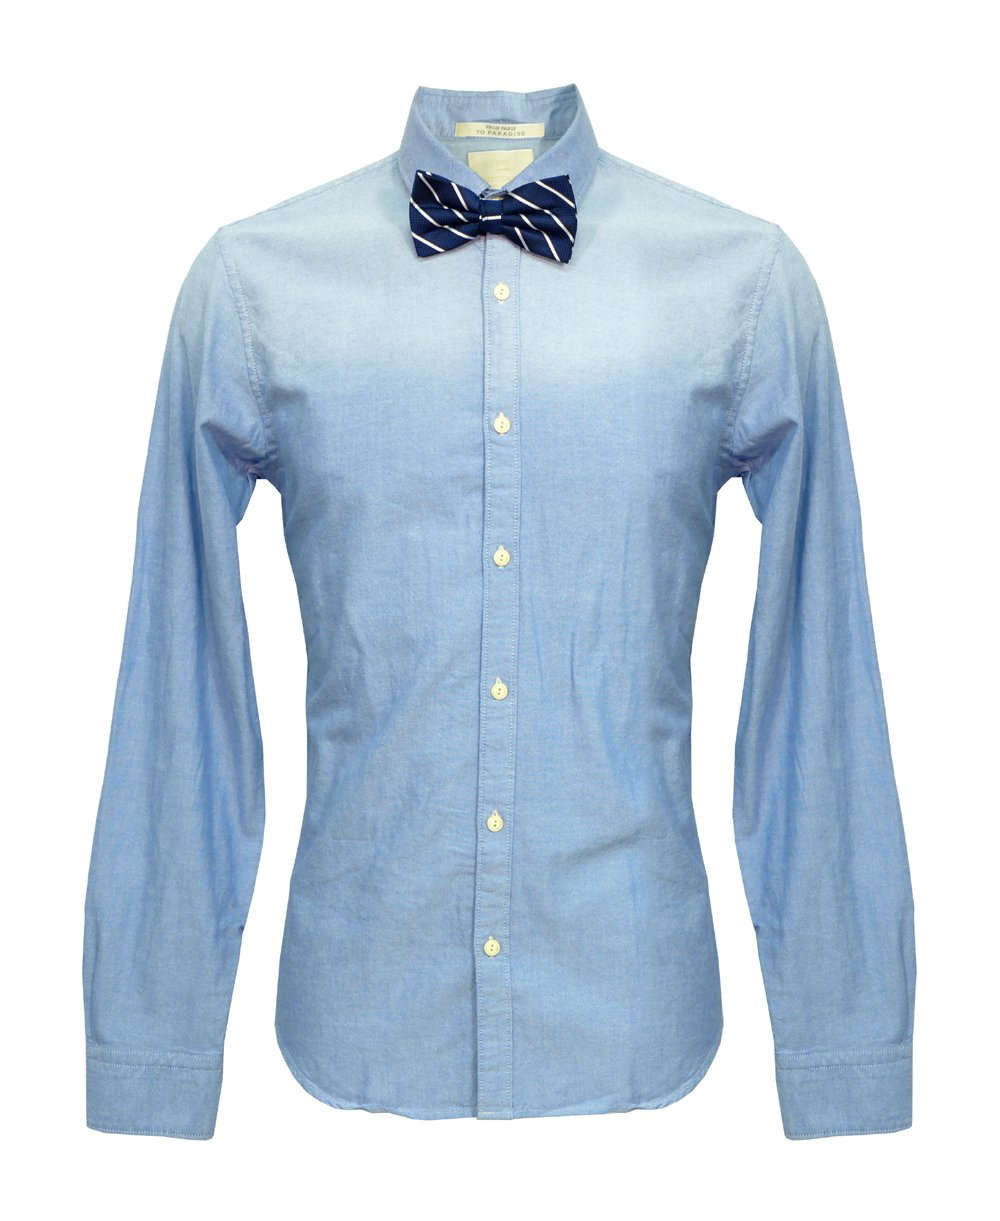 Scotch soda blue navy stripe bow tie 20002 shirt for Blue striped shirt with tie